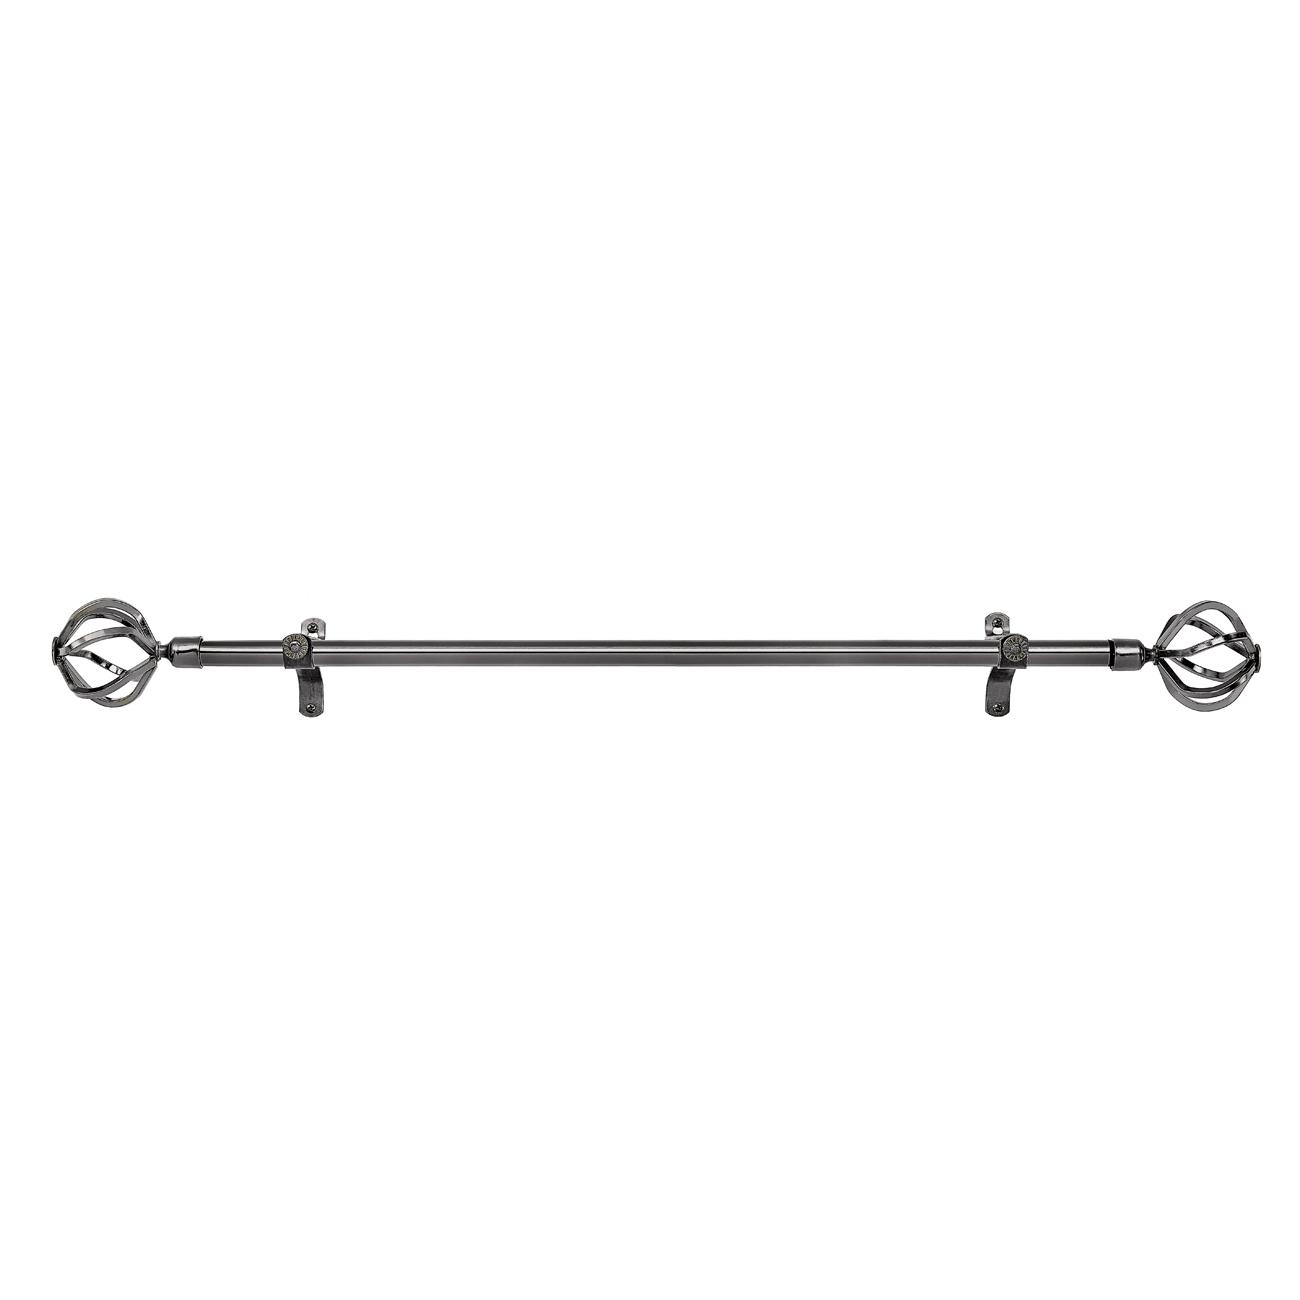 Black Nickel Adjustable Decorative Curtain Rods All Metal Birdcage Finial Sets Ebay